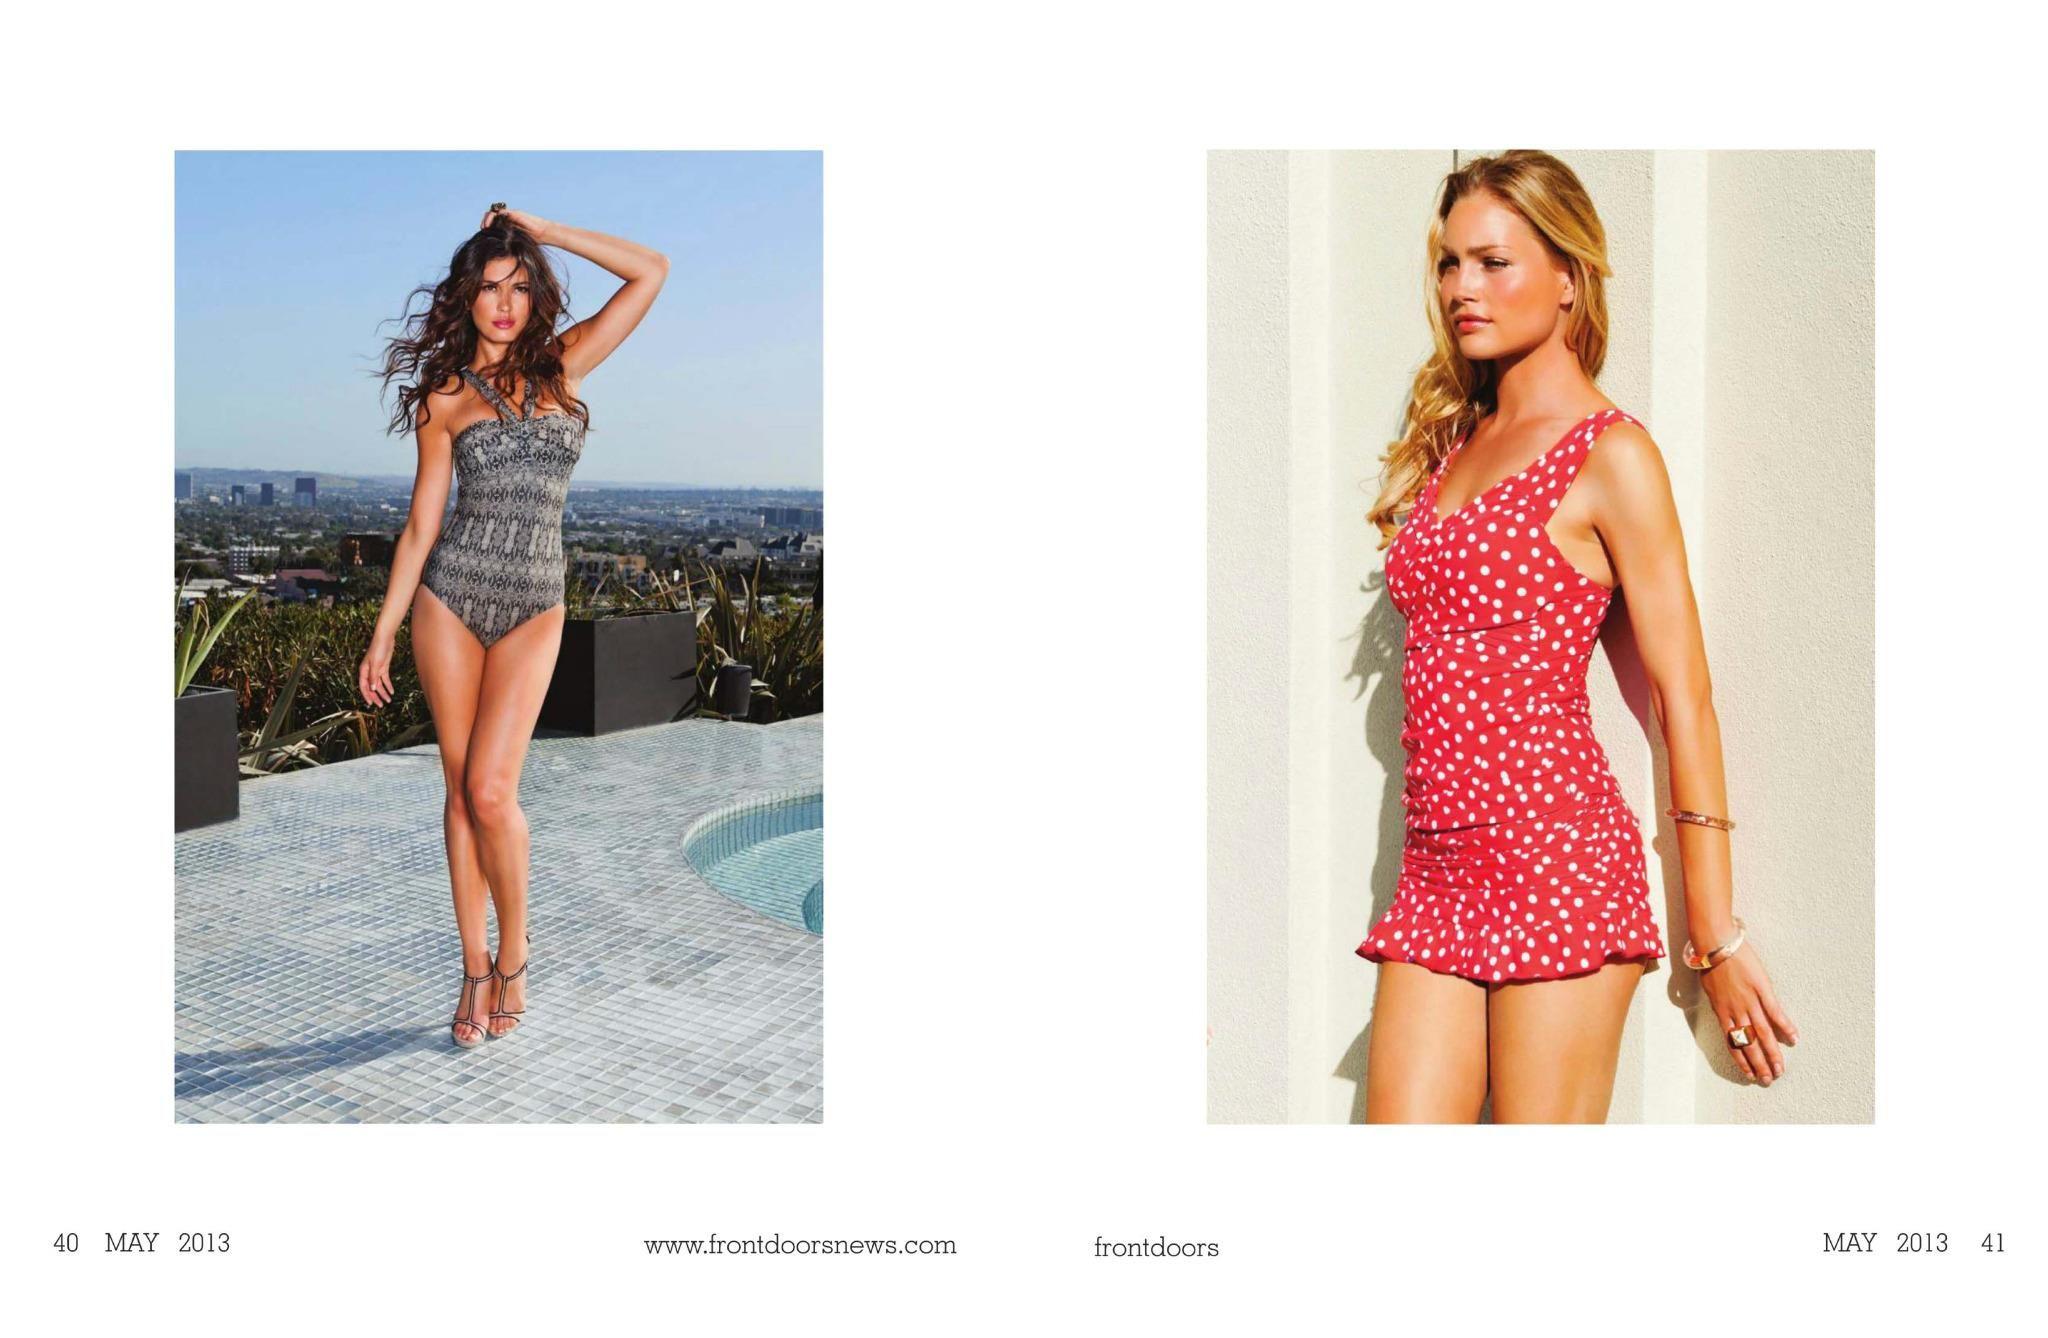 Athena Swimwear